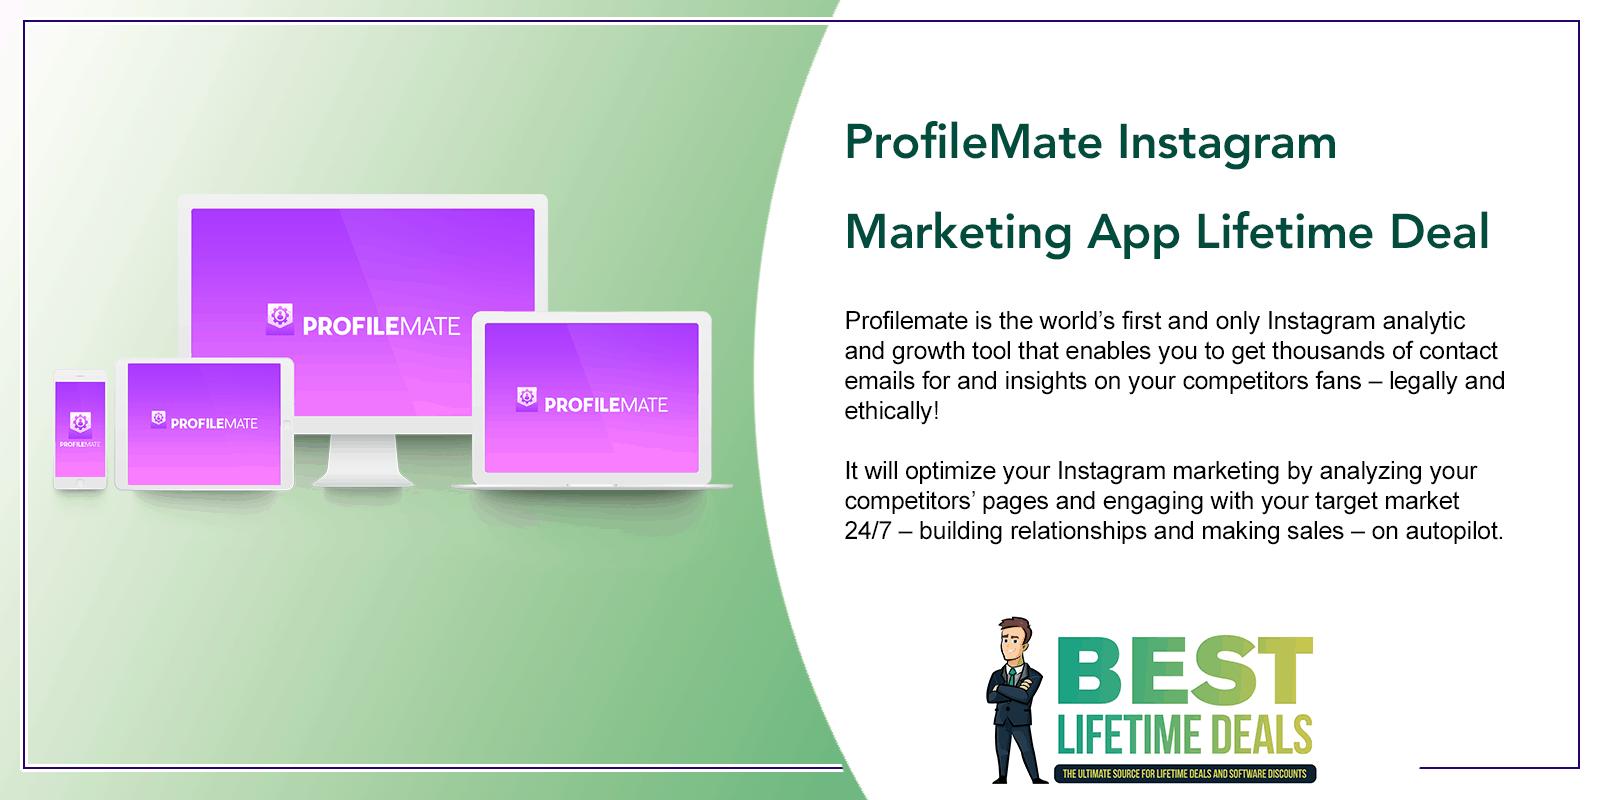 ProfileMate Instagram Marketing App Featured Image